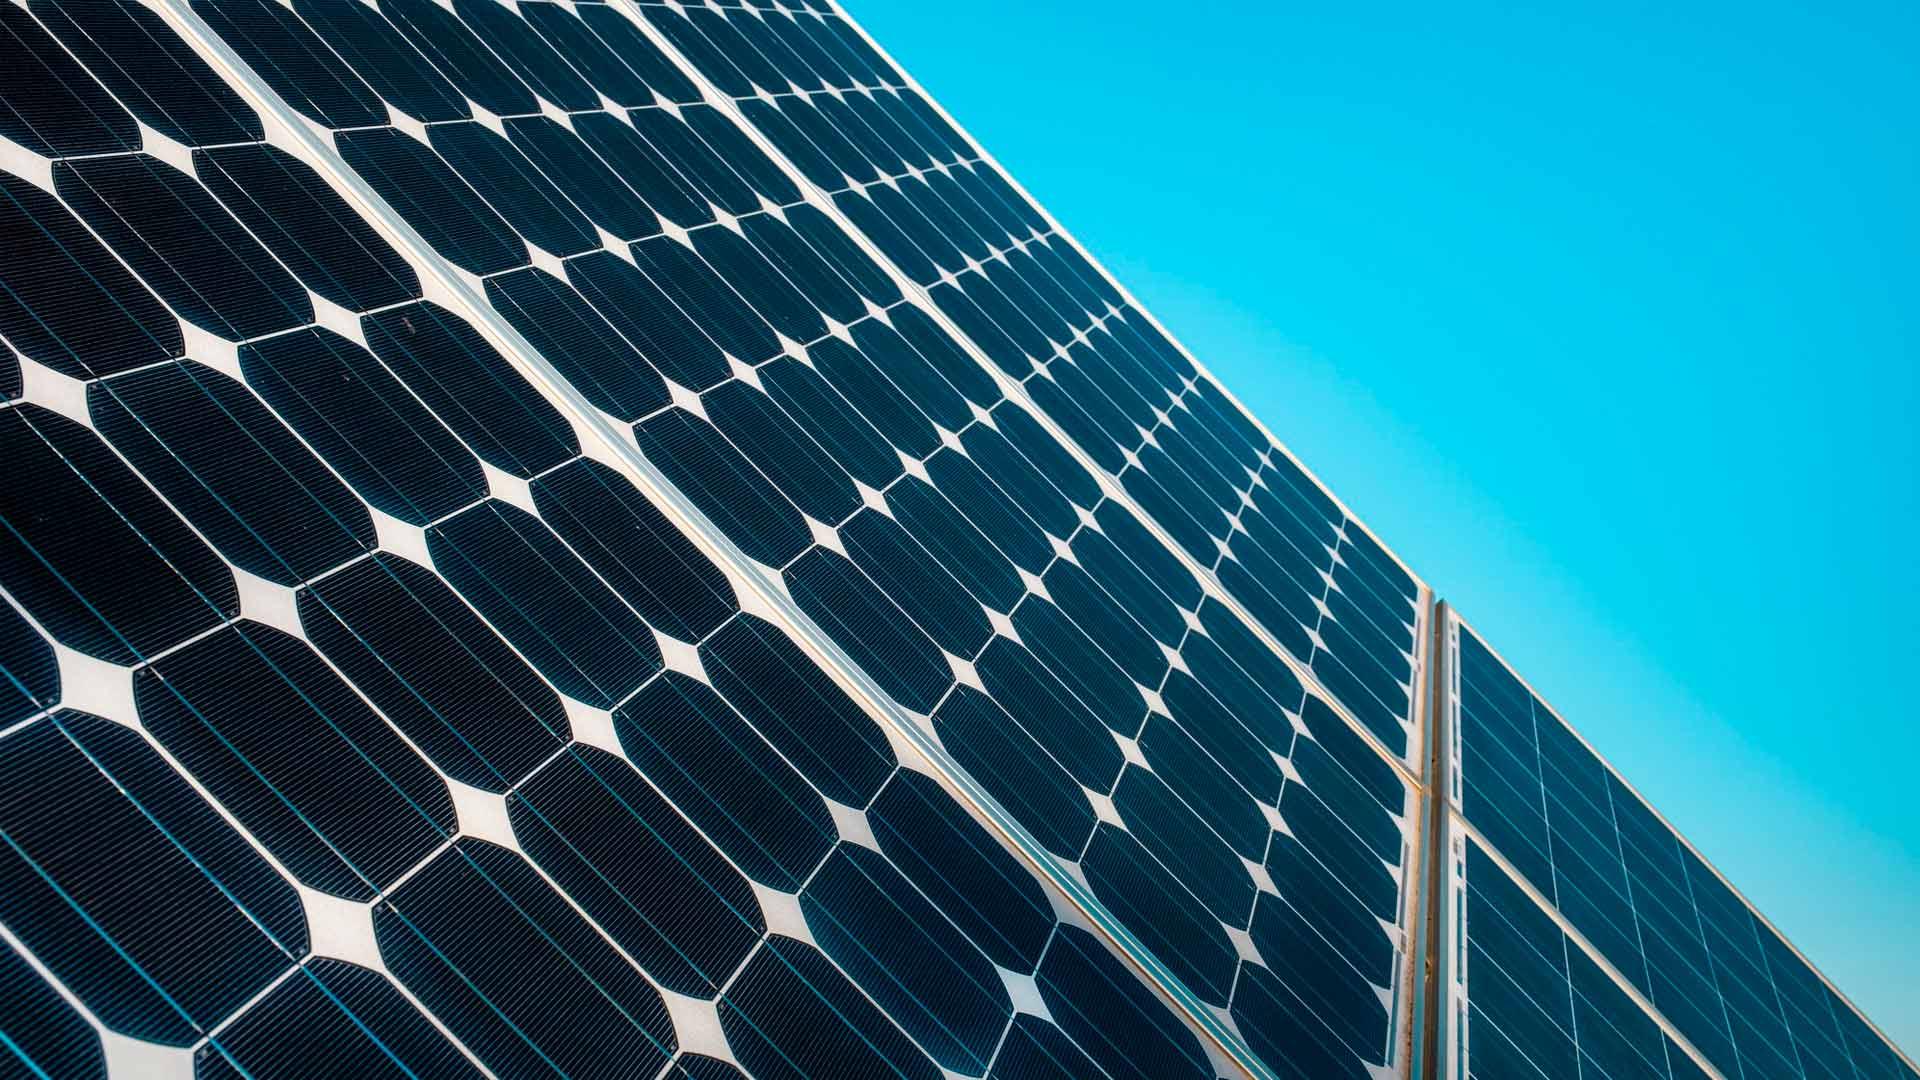 Compromiso con Artealca para instalación de 260 kWp en Valverde de Leganés